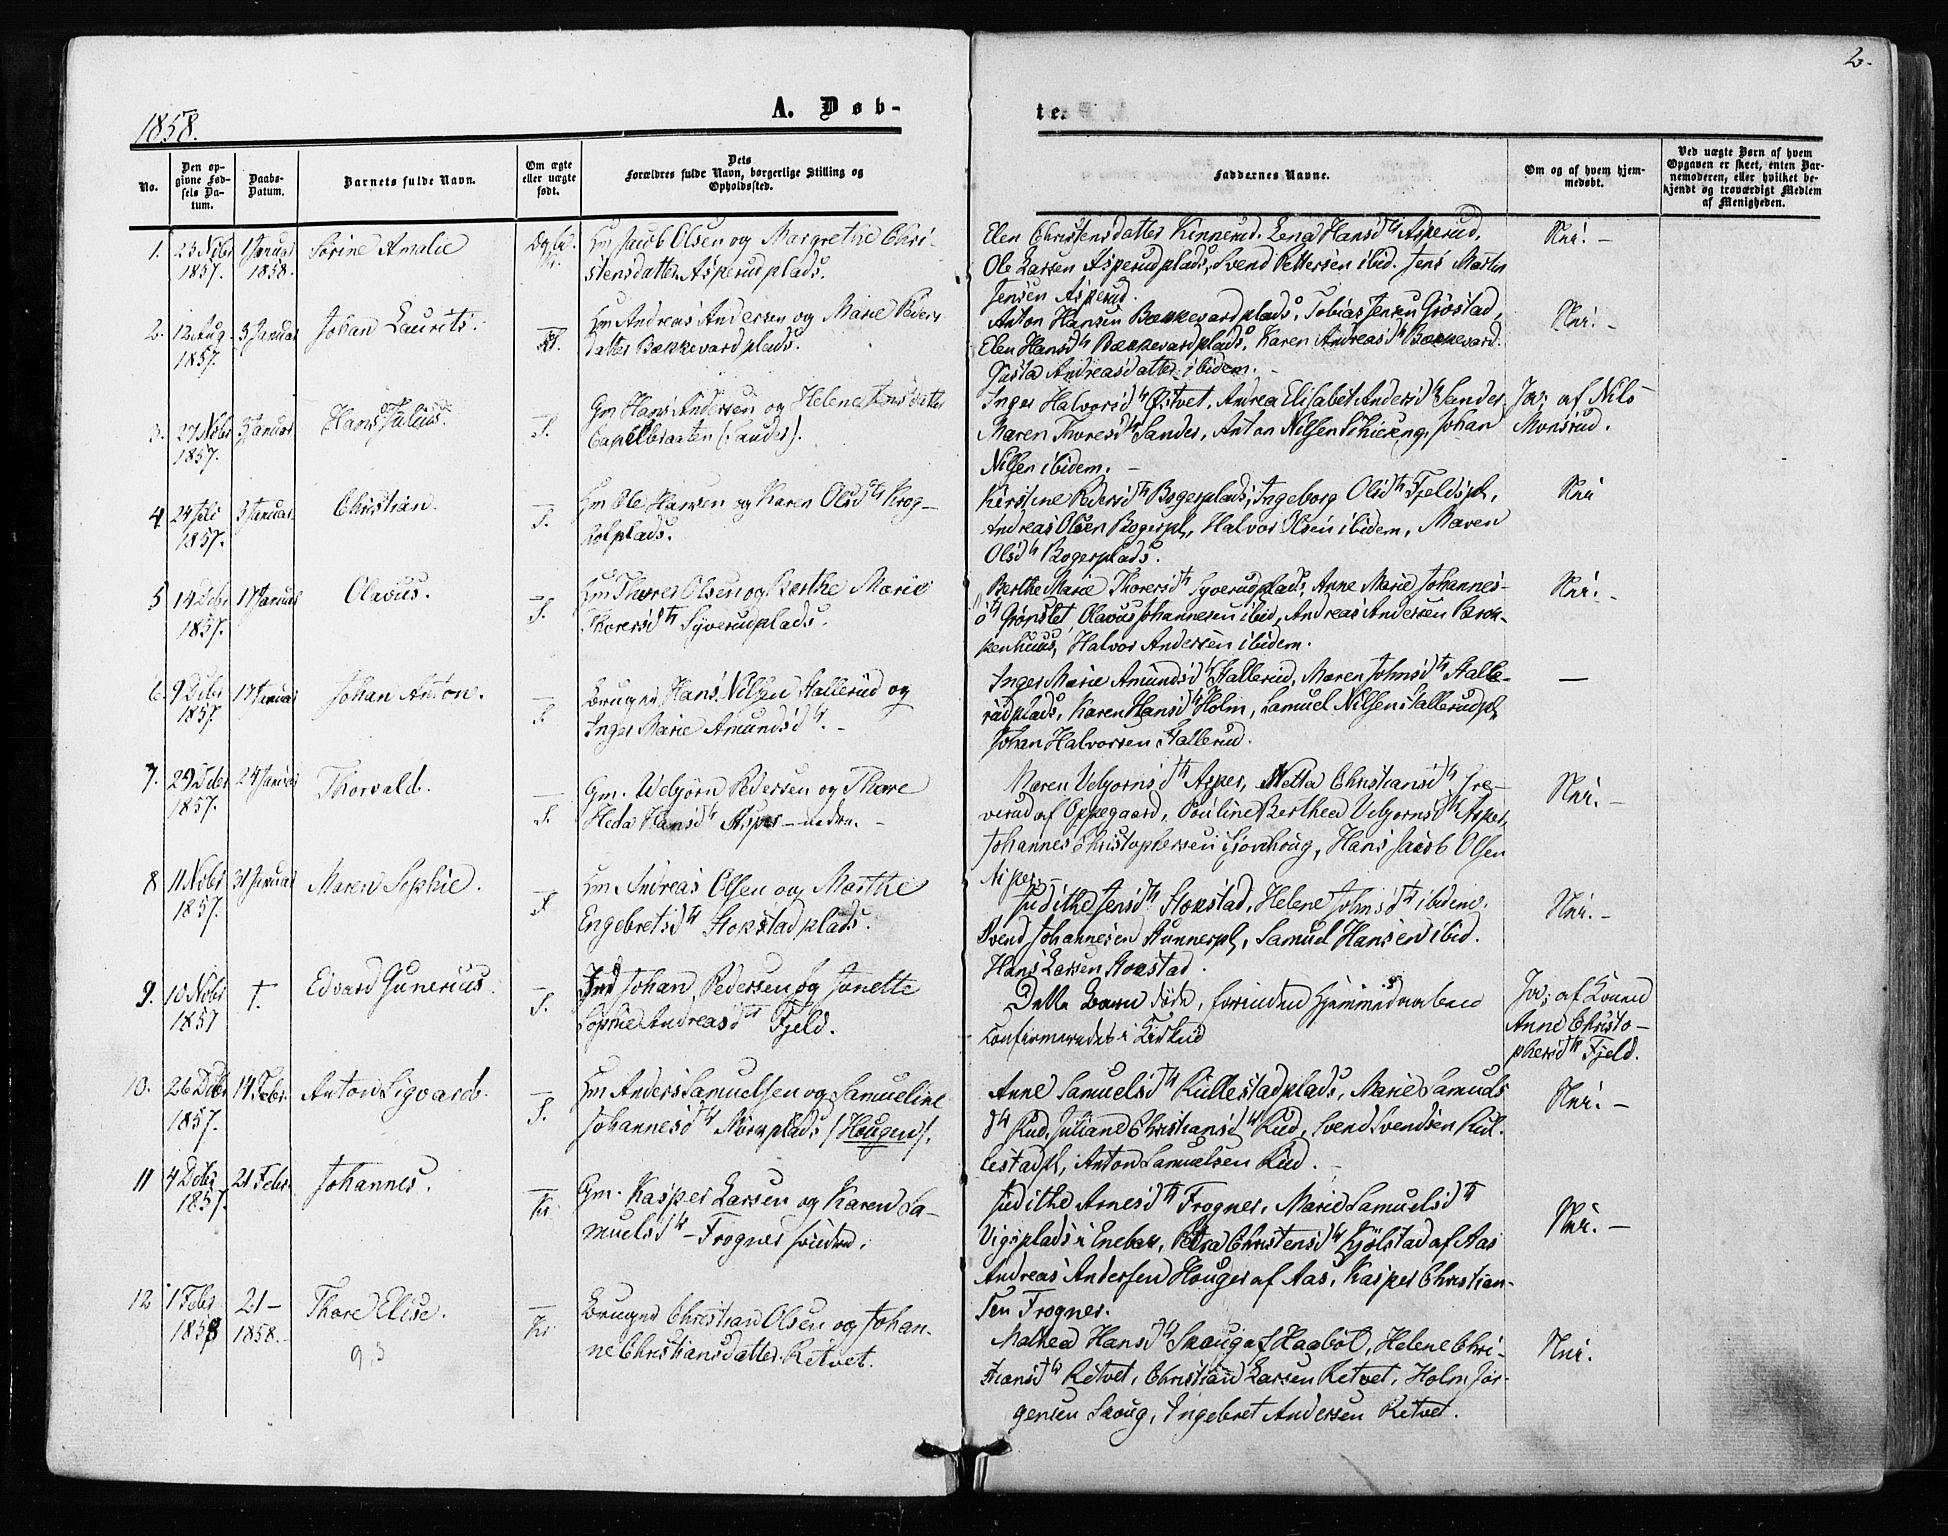 SAO, Kråkstad prestekontor Kirkebøker, F/Fa/L0007: Ministerialbok nr. I 7, 1858-1870, s. 2